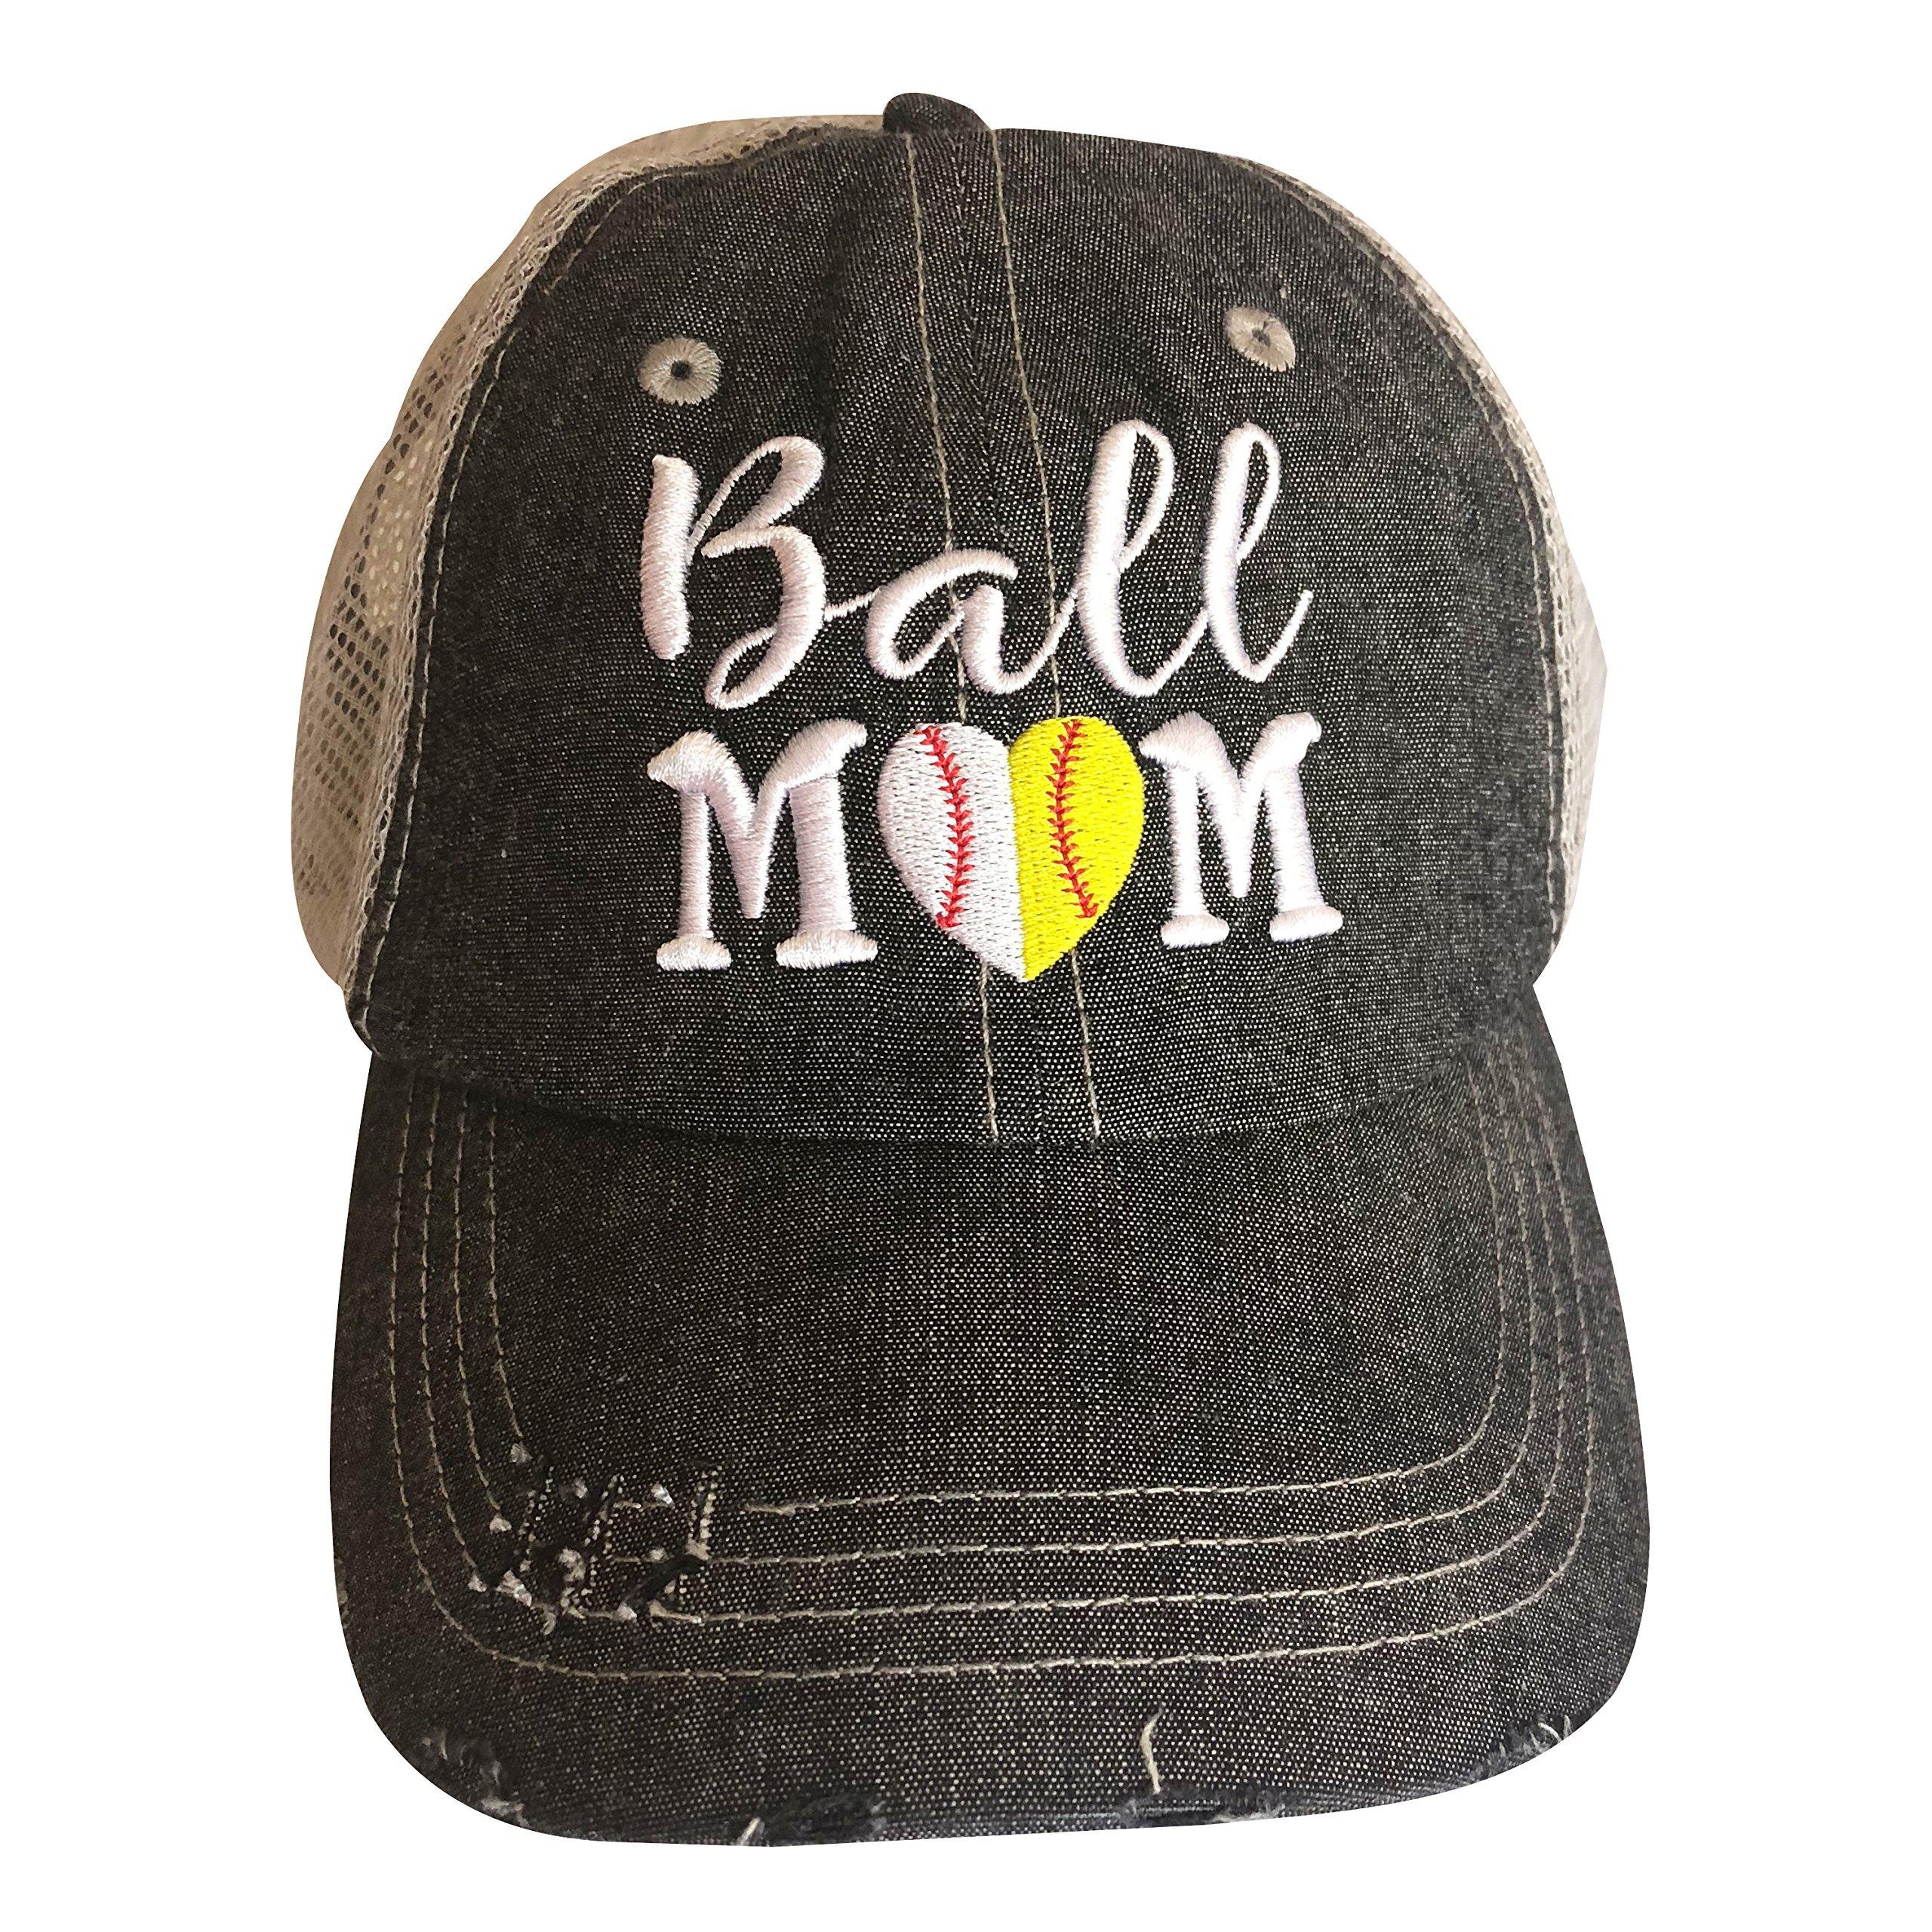 Cocomo Soul Embroidered Ball MOM Softball Mom Baseball Mom Mesh Trucker Style Hat Cap